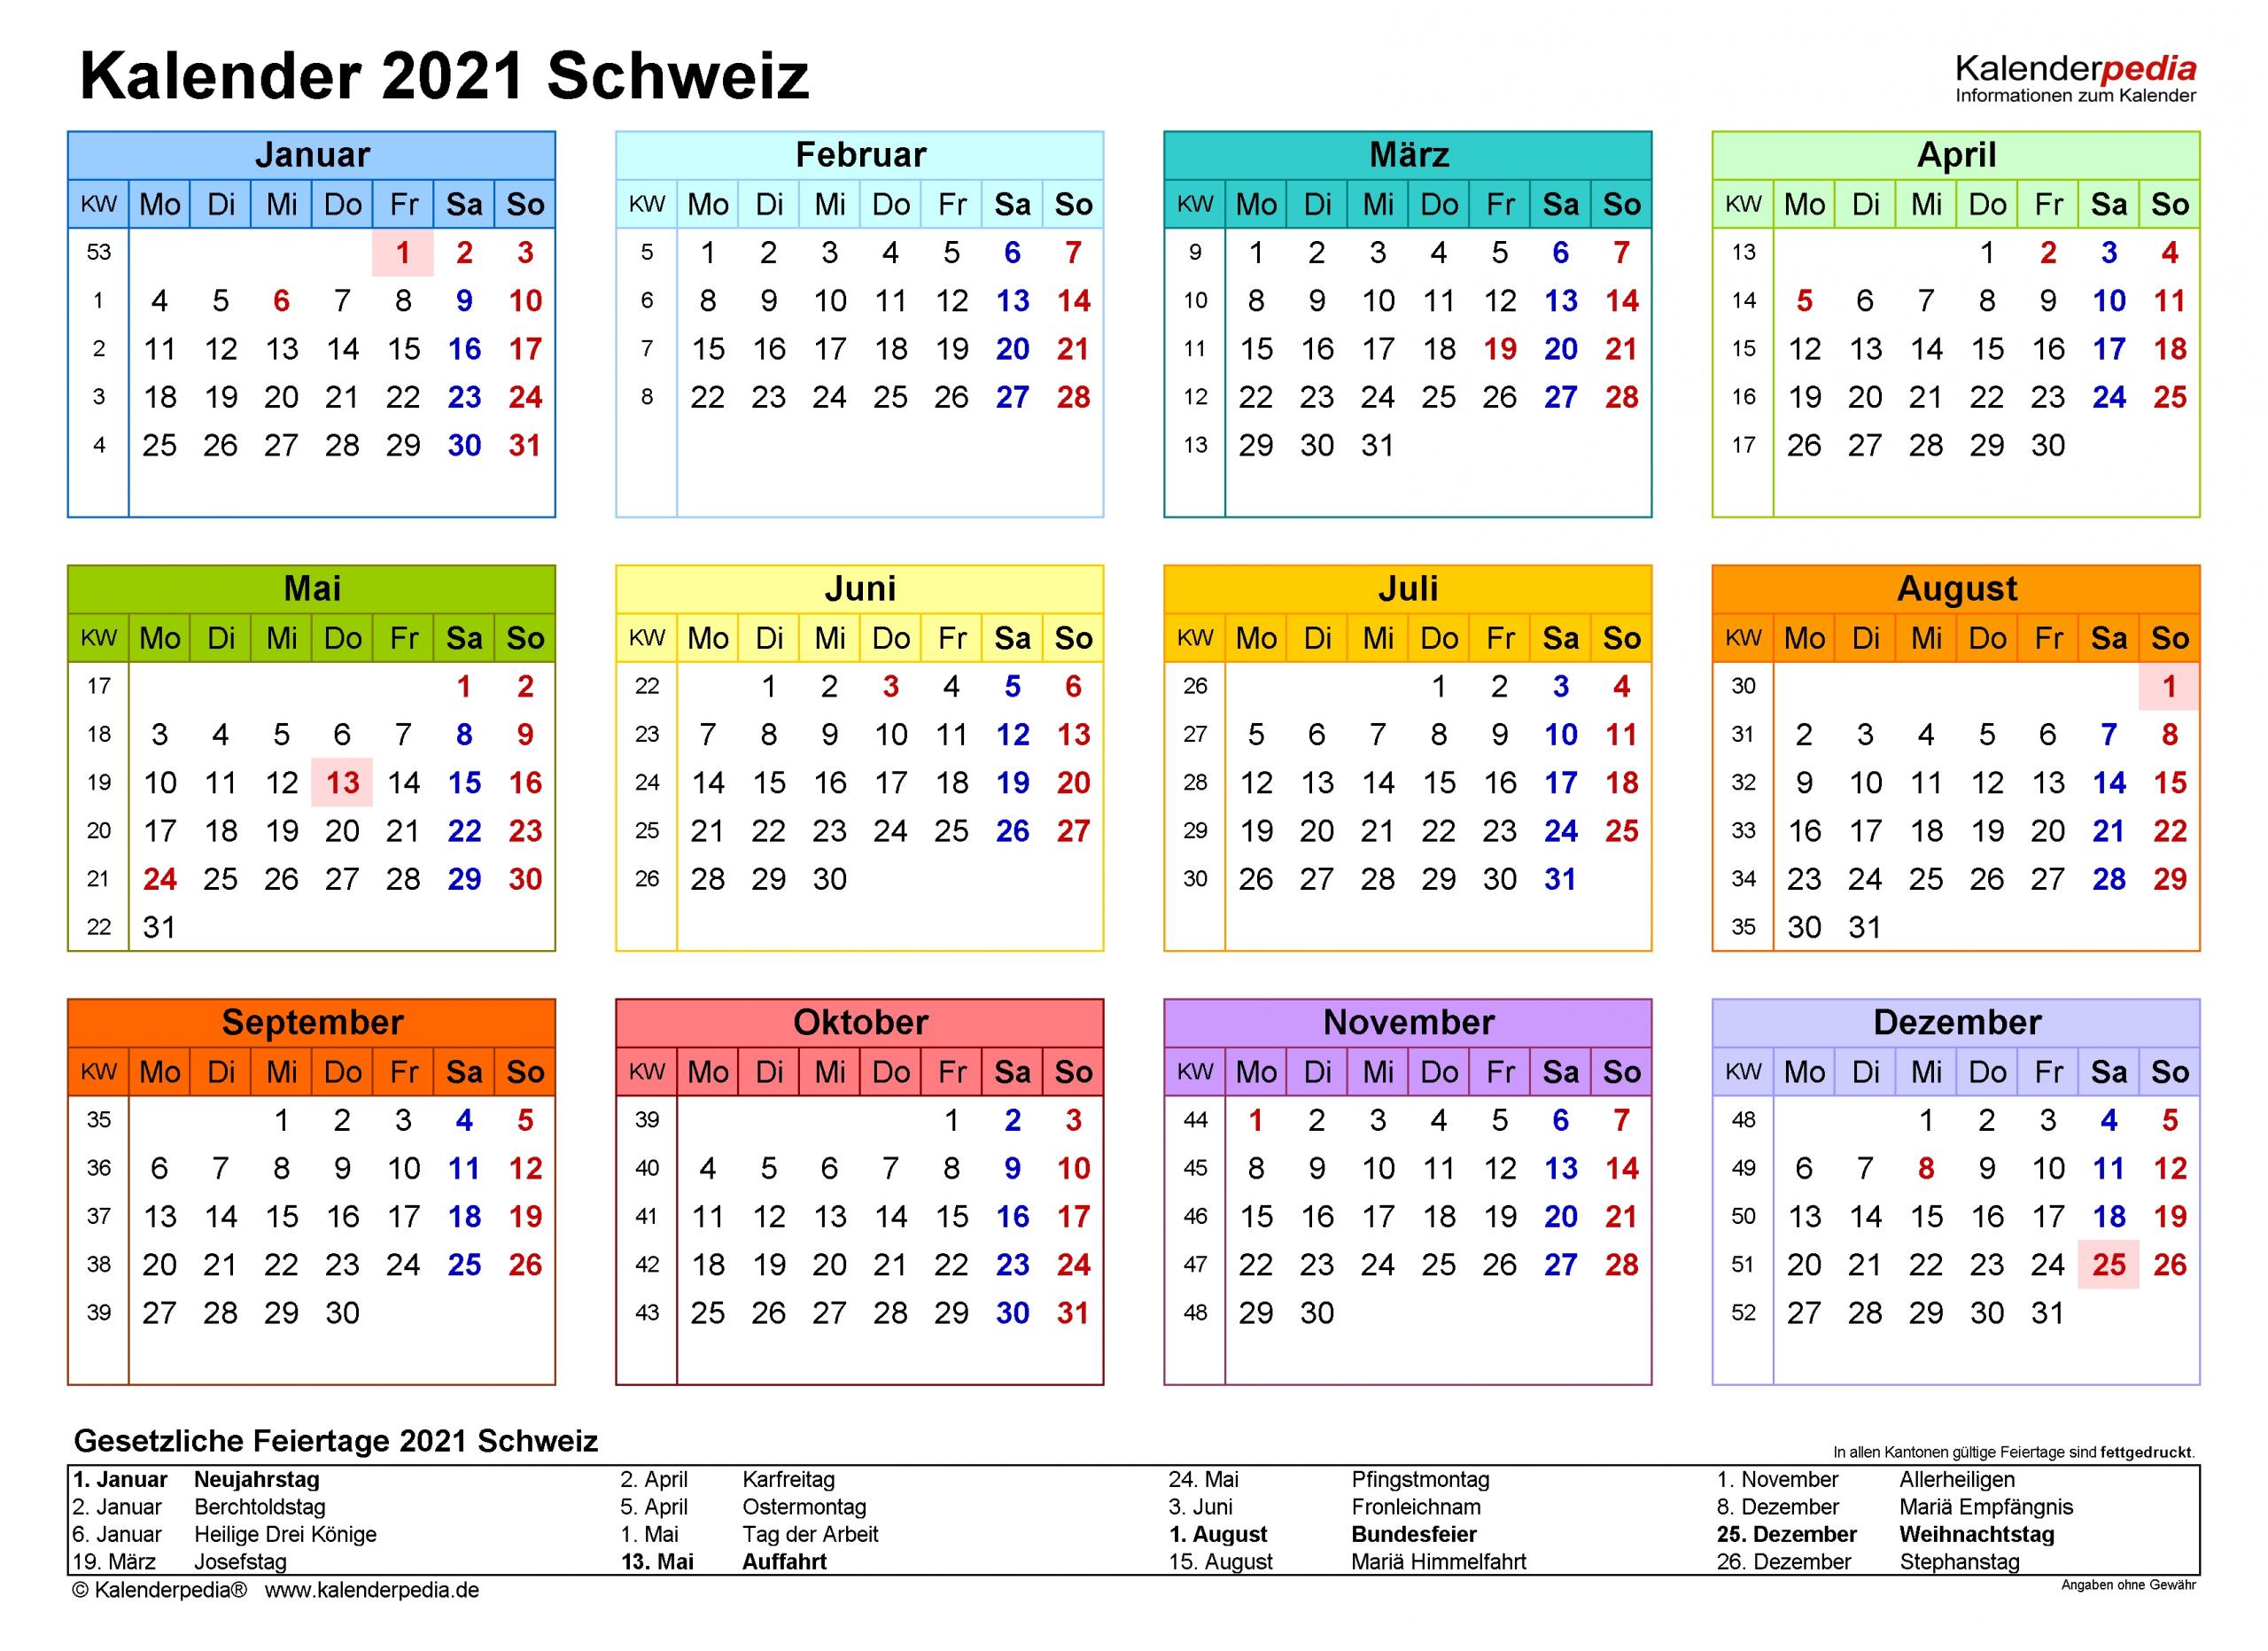 Catch Kalenderpedia 2021 Schweiz Pro Monat